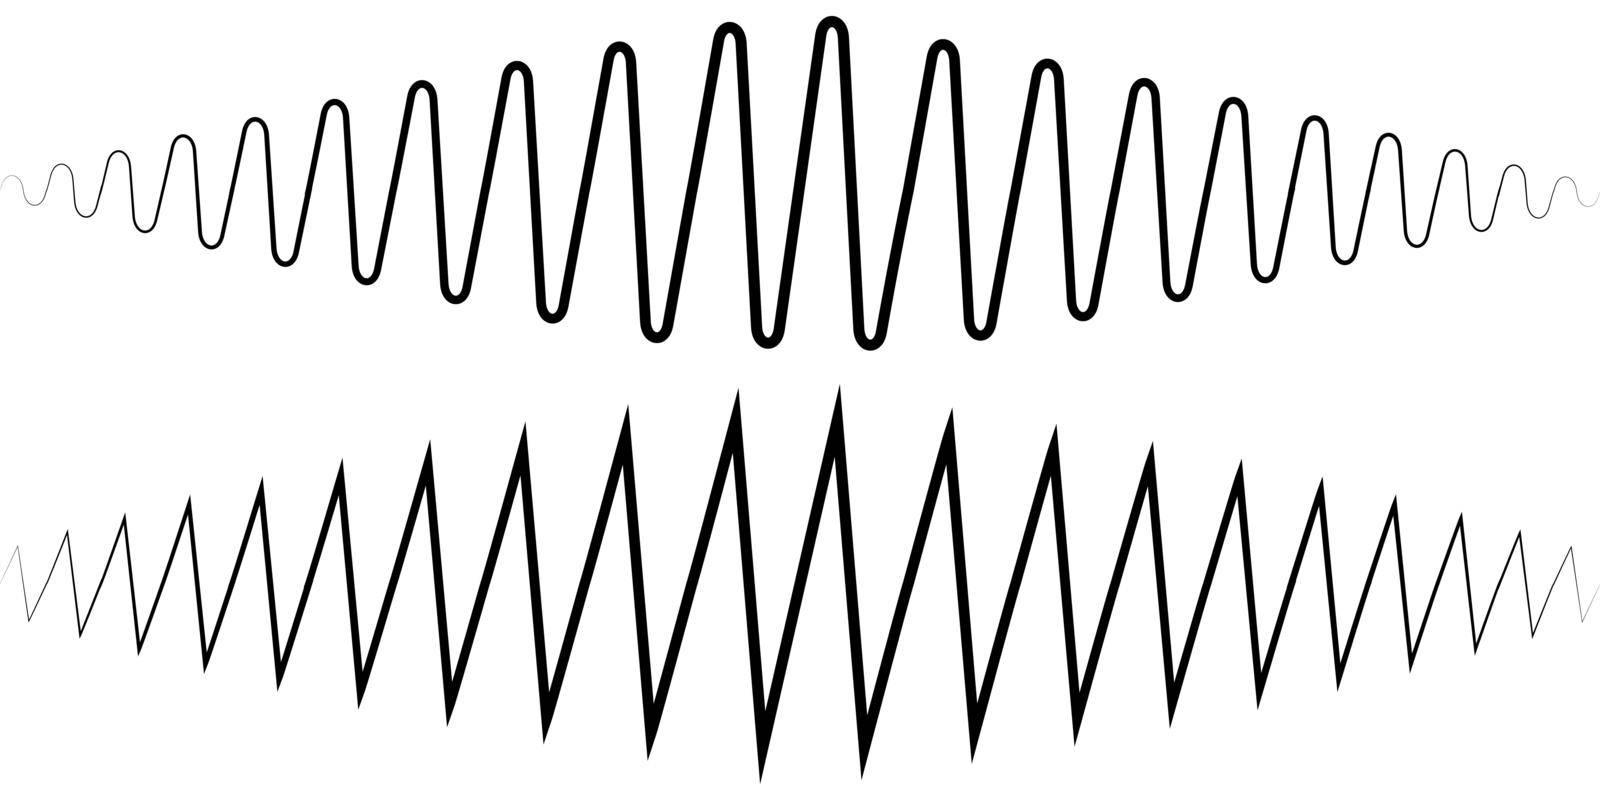 Audio sound wave. Sound wave amplitude tattoo voice recording, music audio icon, equalizer, radio logo and waveform amplitude music design ringtones by koksikoks